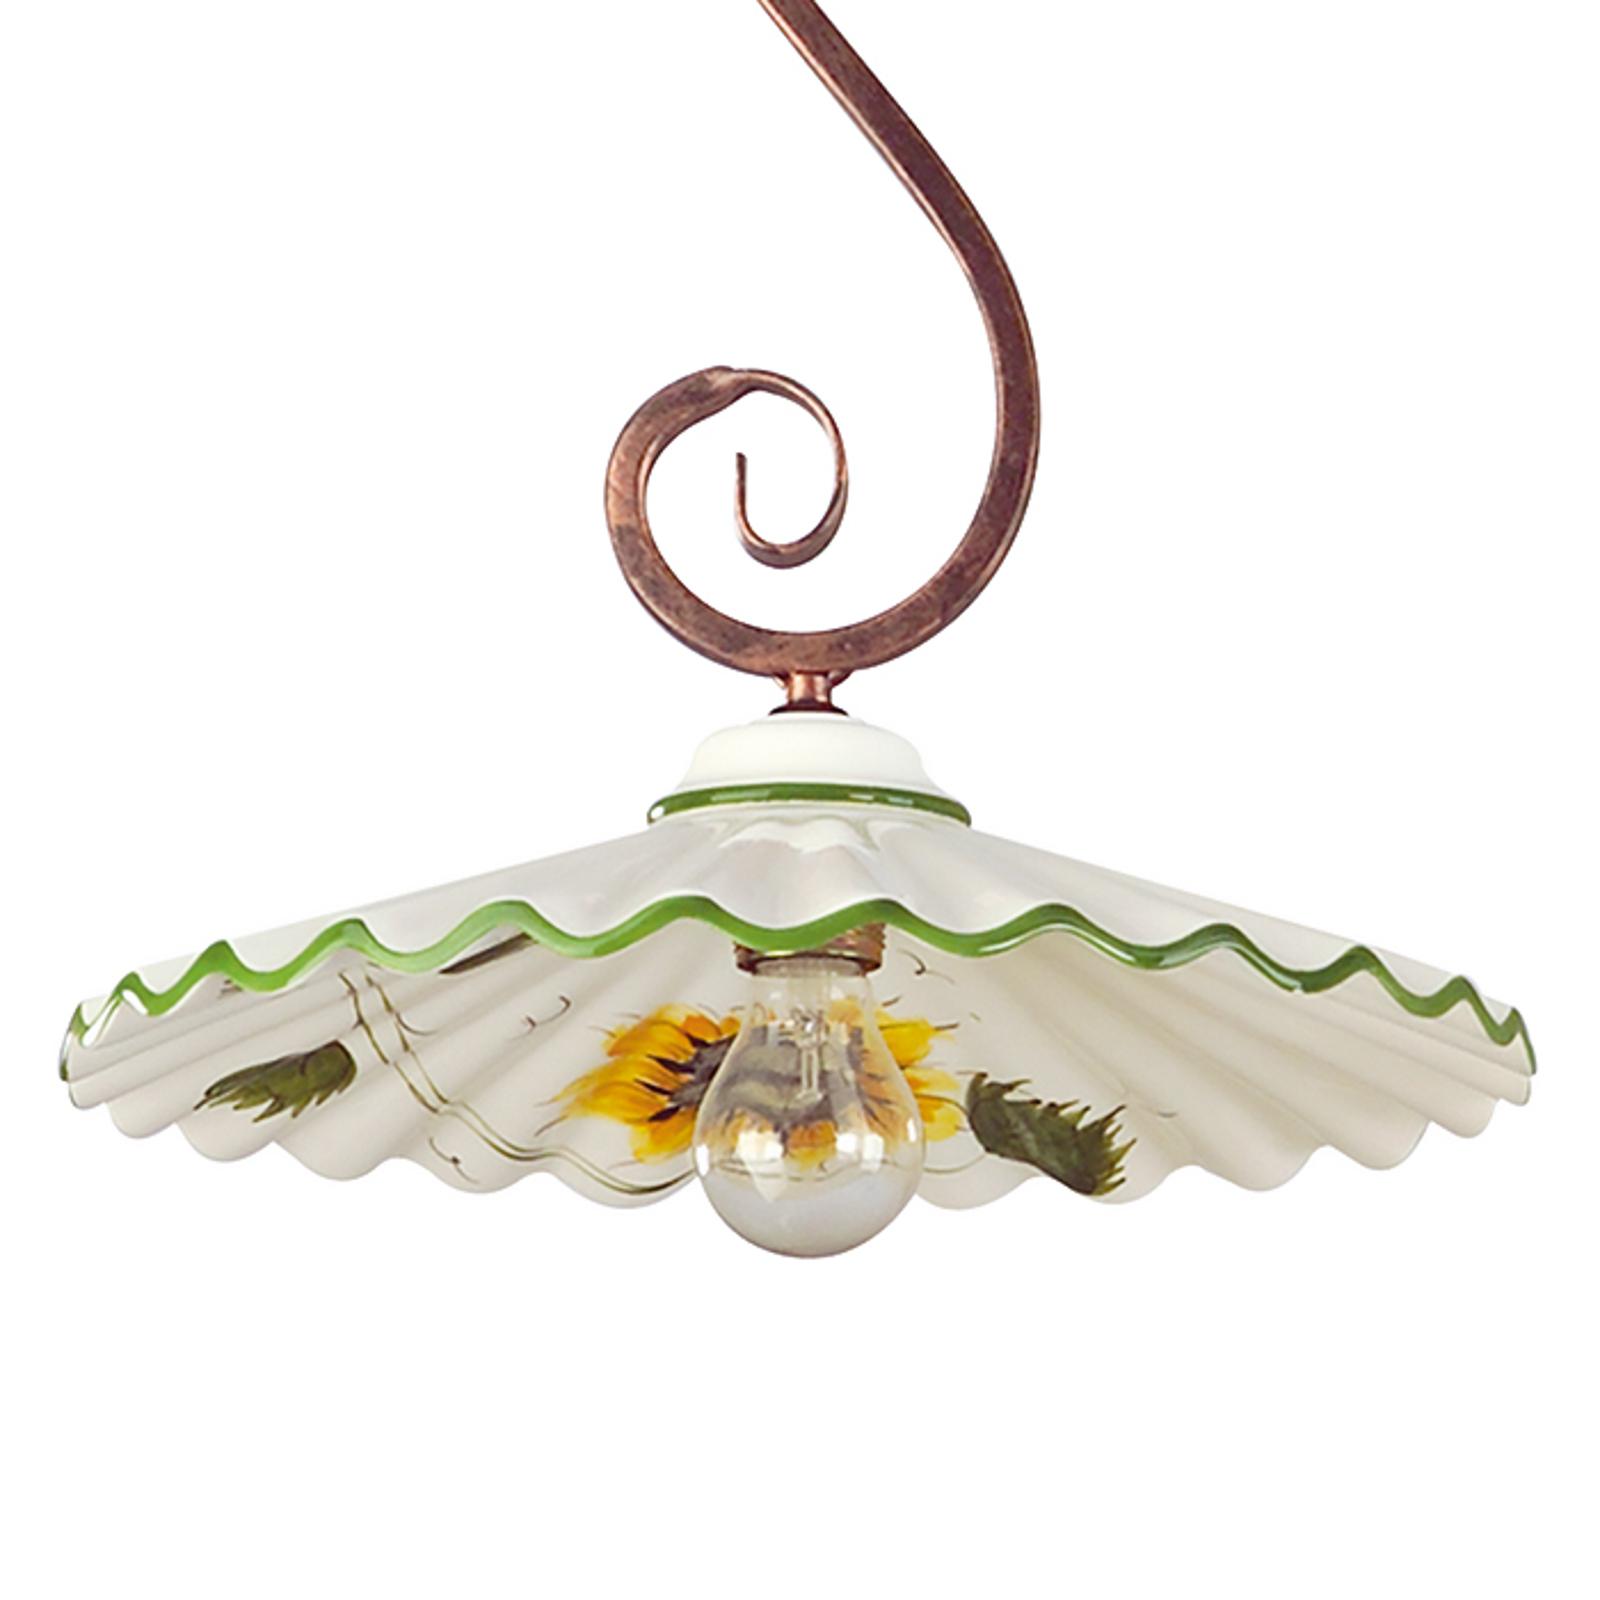 Hanging light Rusticana, S-shaped suspension_3046107_1